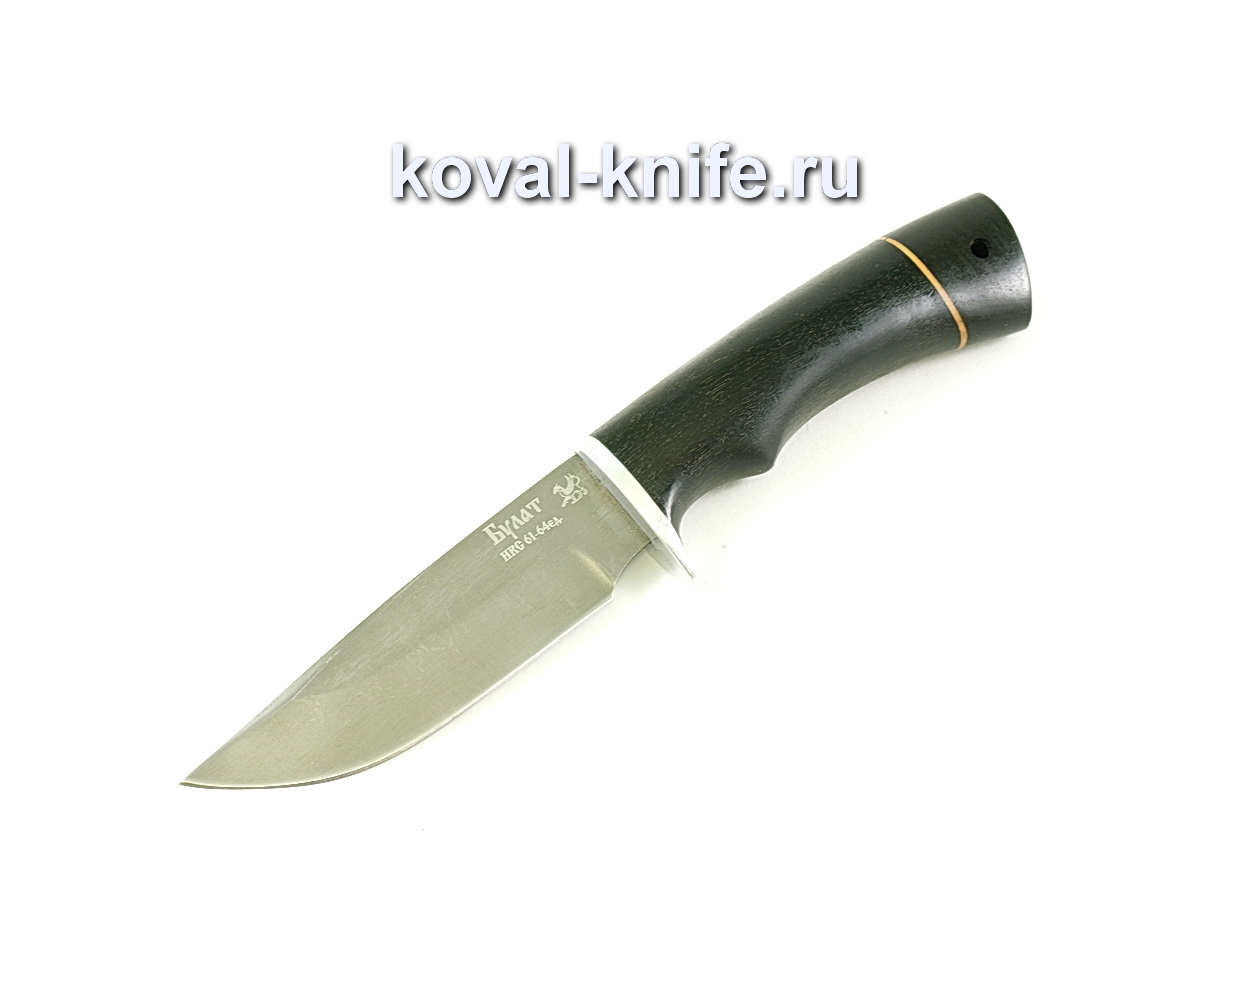 Нож Норвег (сталь Булат), рукоять граб A051